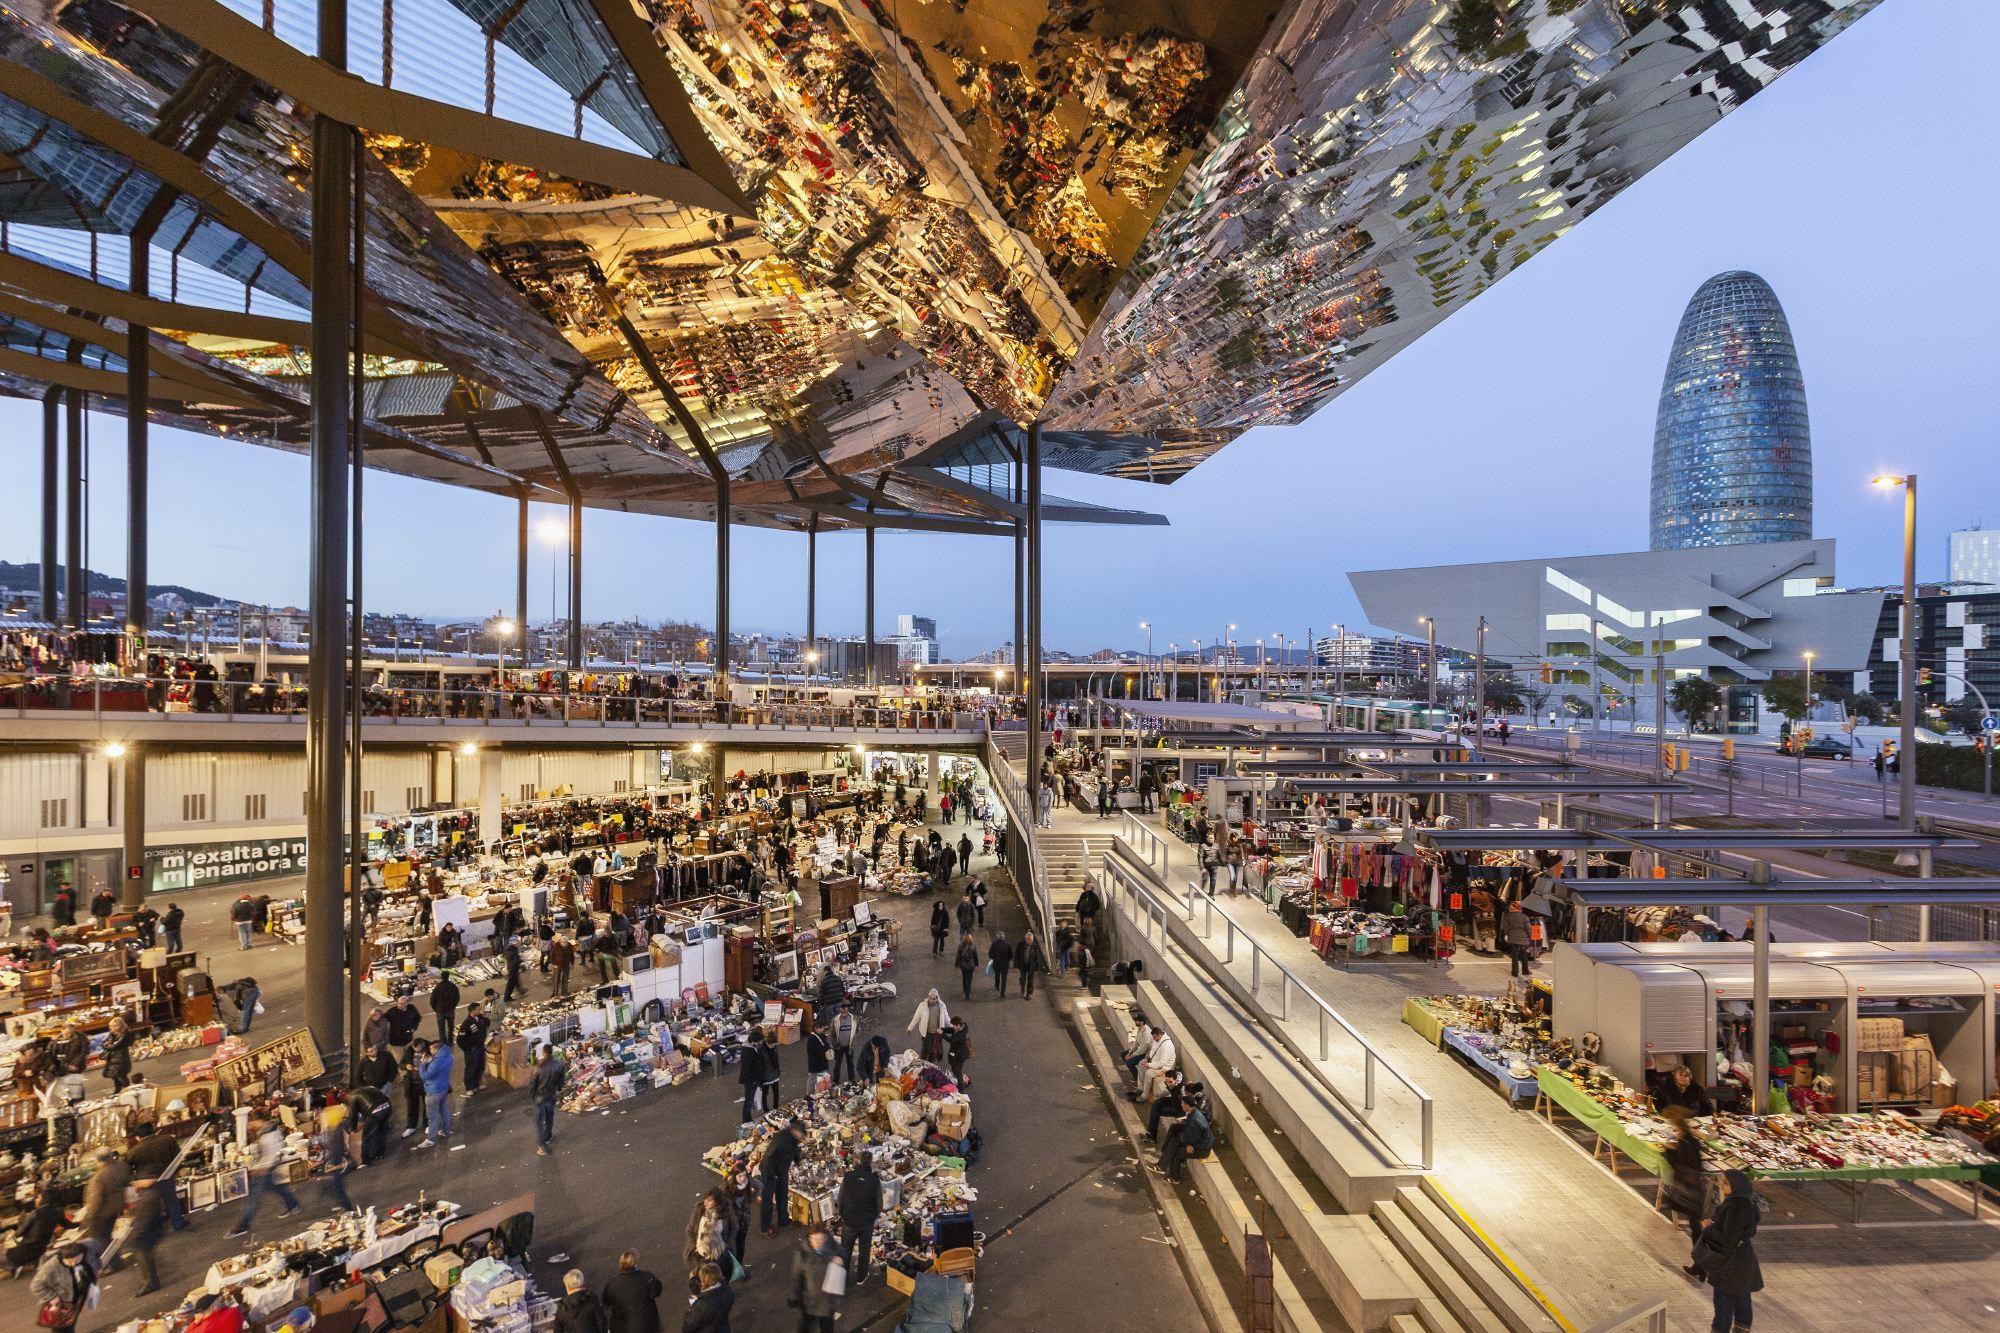 barcelona flea market, public space,architecture, mirrors, glories, b720 Architetcs, fermin vazquez, rafaelvargas photo